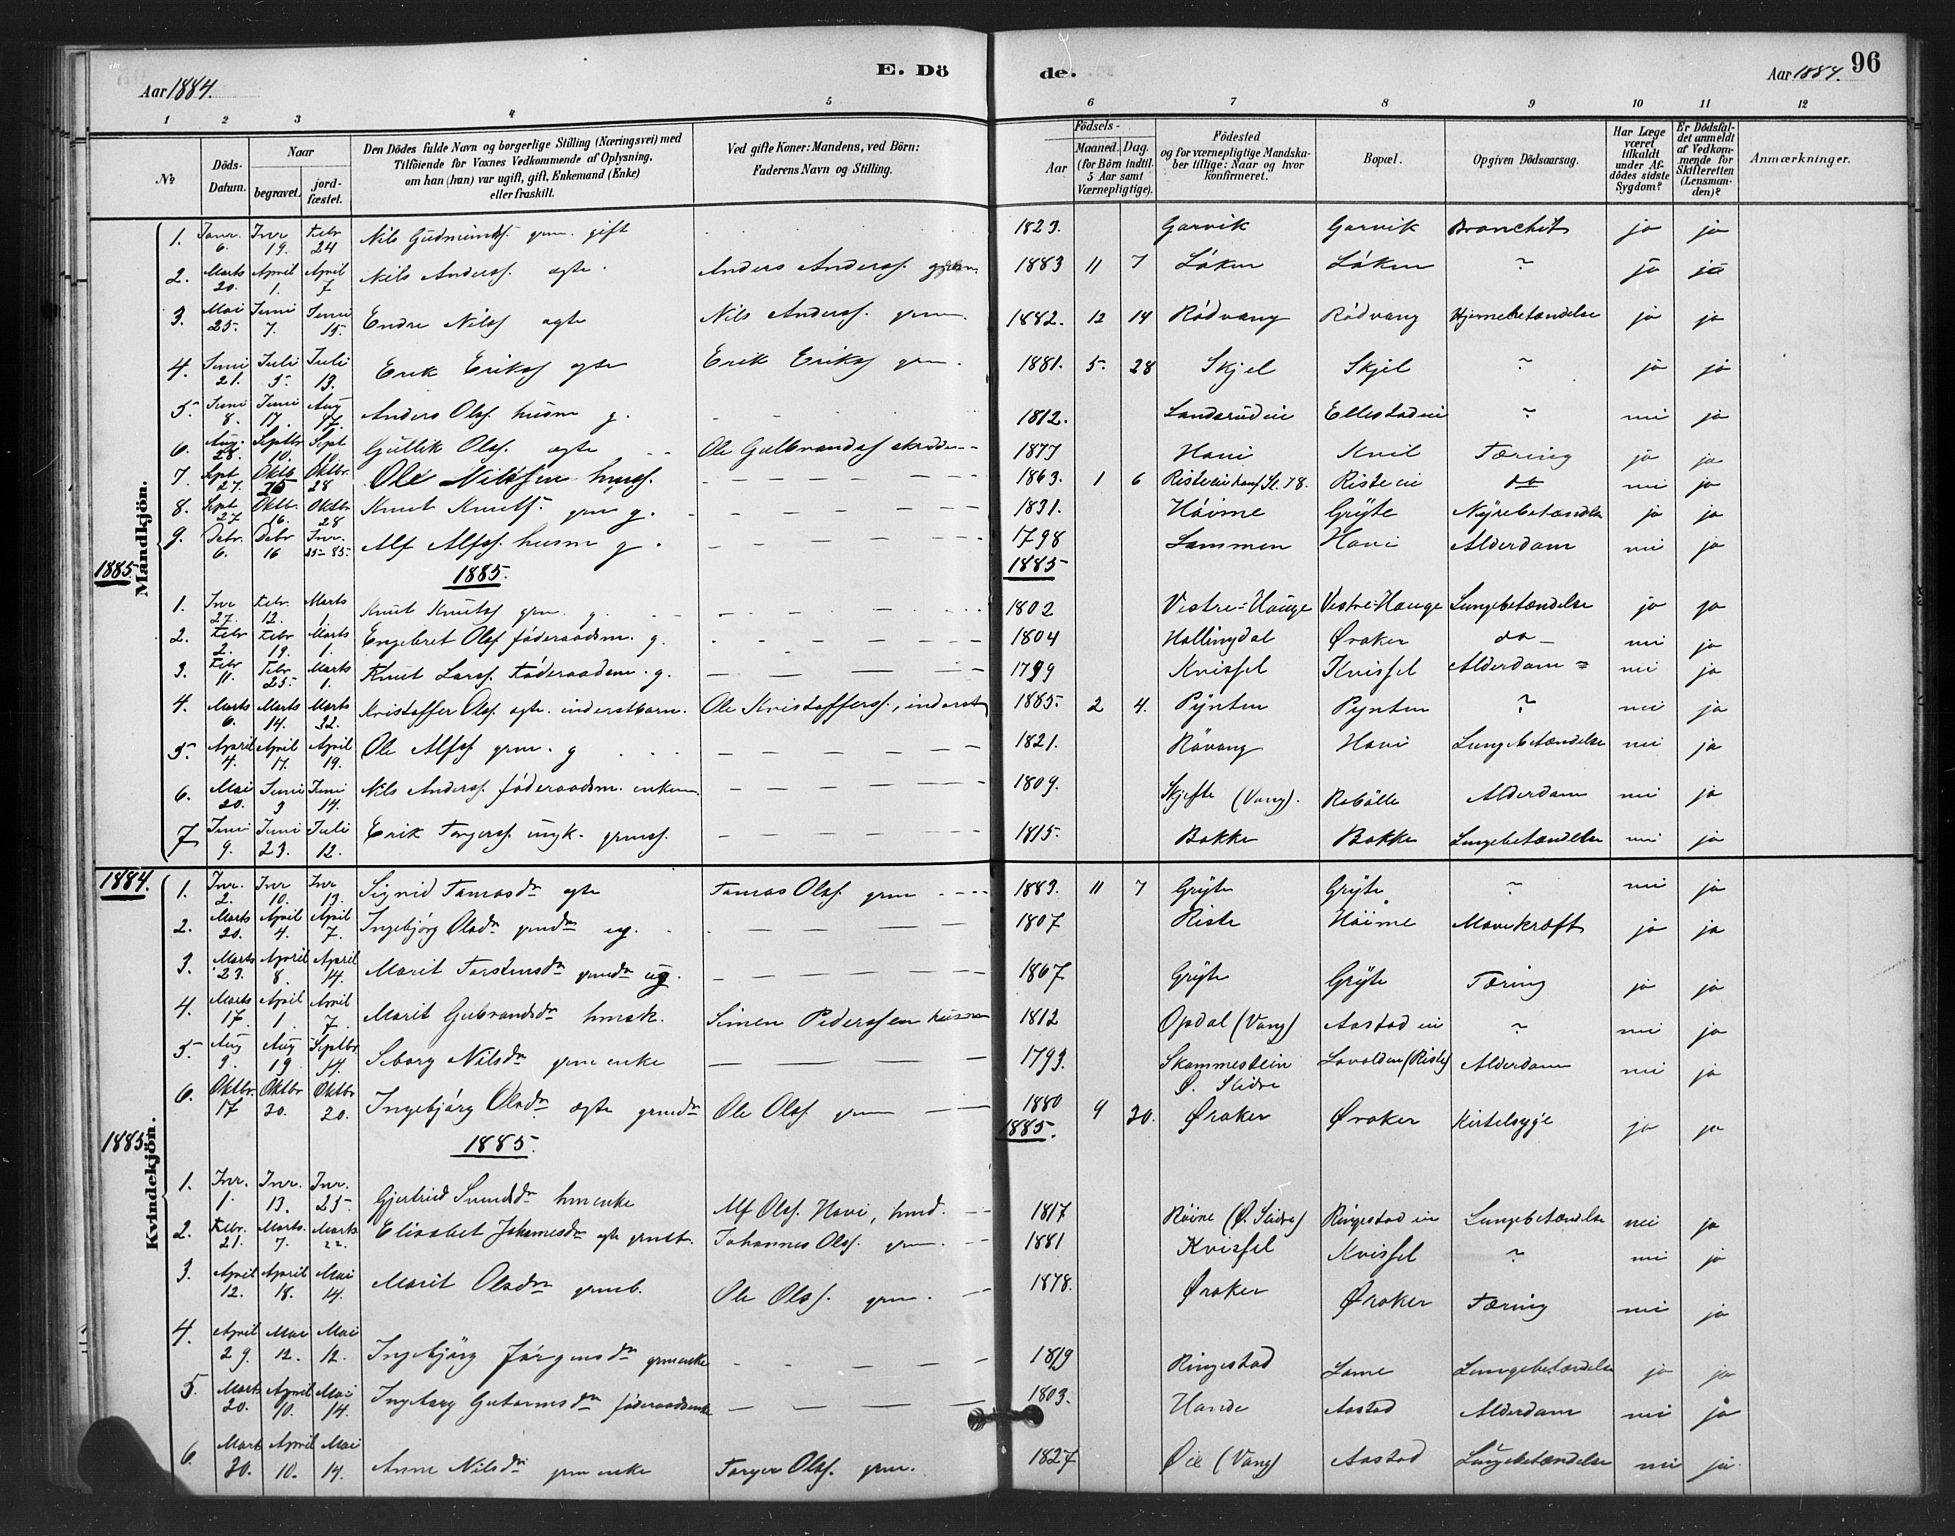 SAH, Vestre Slidre prestekontor, Klokkerbok nr. 6, 1881-1915, s. 96